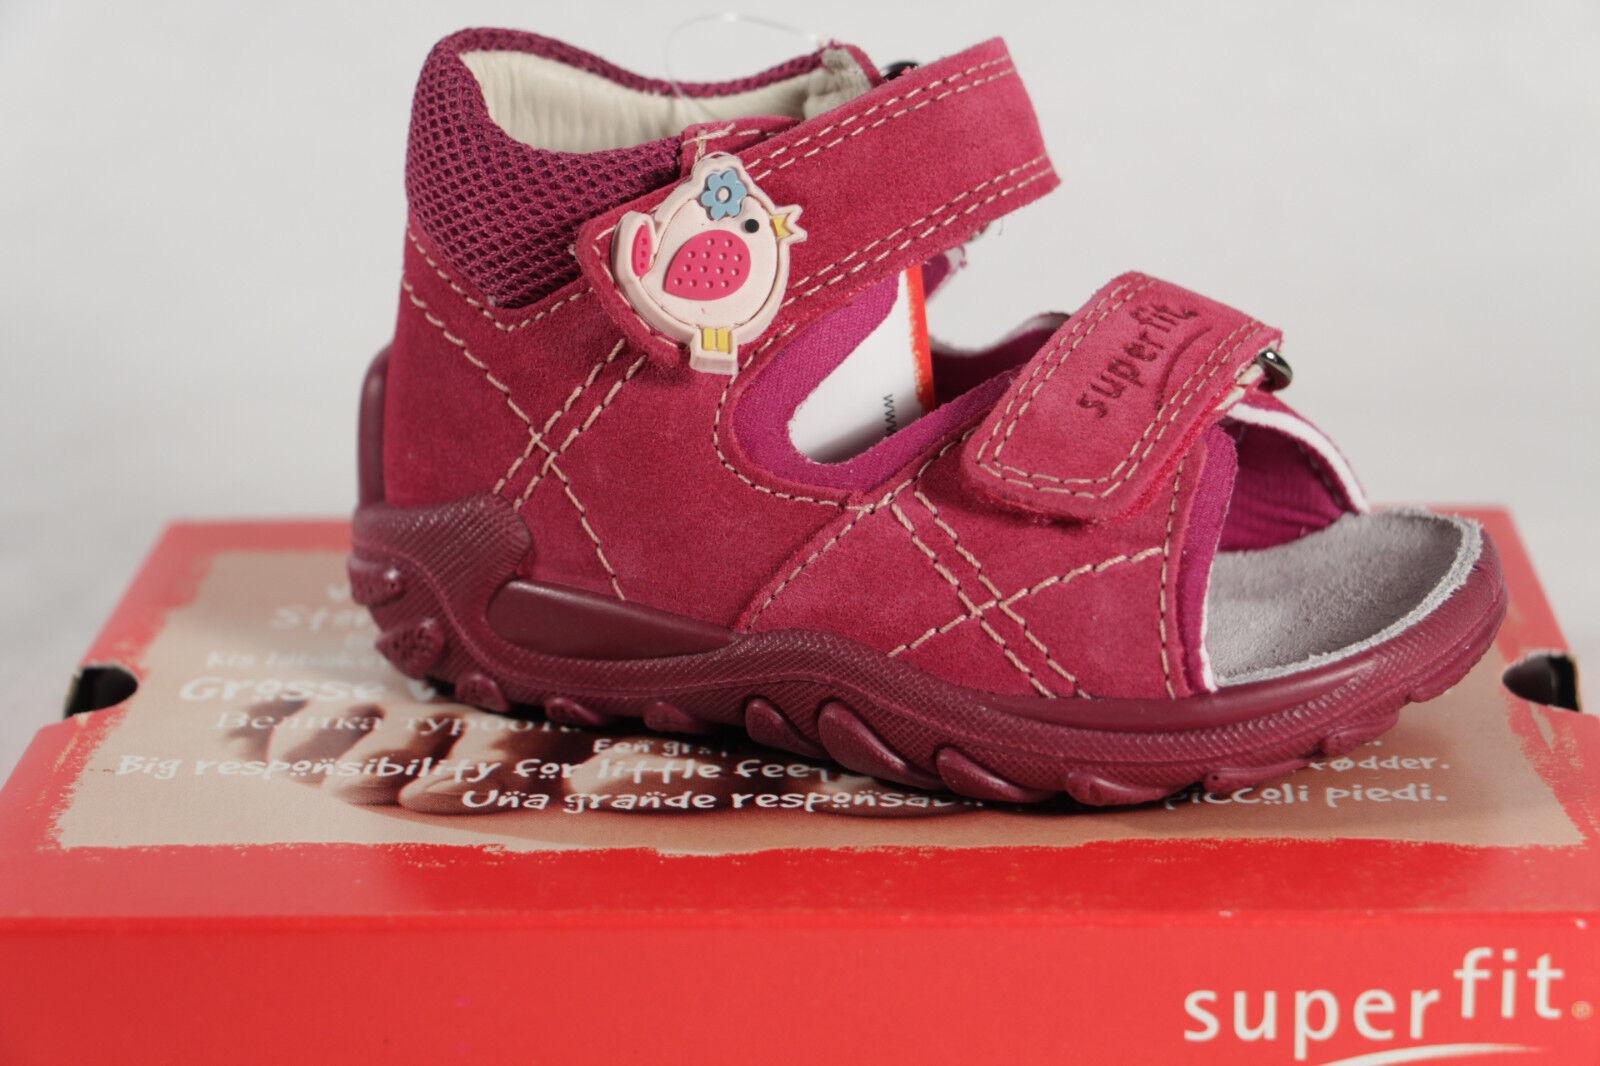 Superfit Mädchen Lauflern Sandale Sandalette Echtleder Rosa Neu